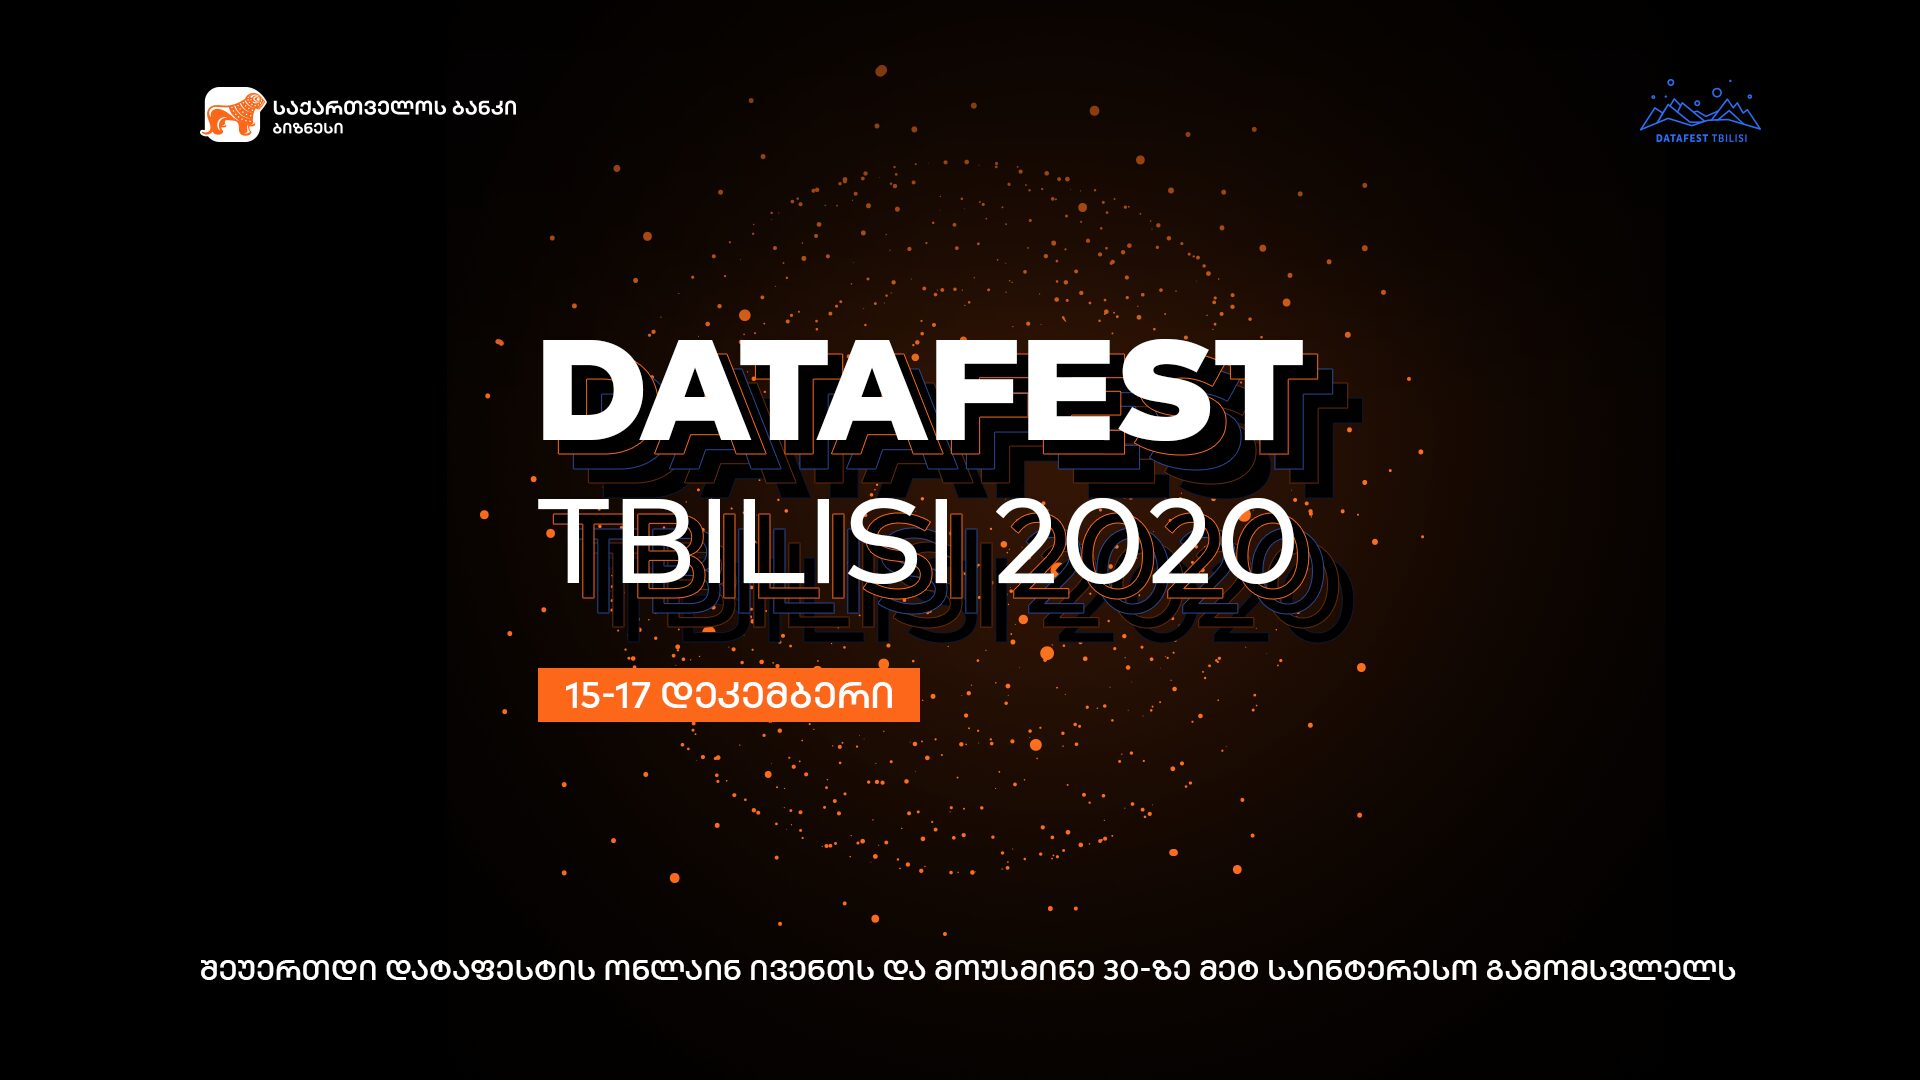 Photo of საქართველოს ბანკის მხარდაჭერით საერთაშორისო მონაცემთა ფესტივალი DataFest Tbilisi 2020 მიმდინარეობს